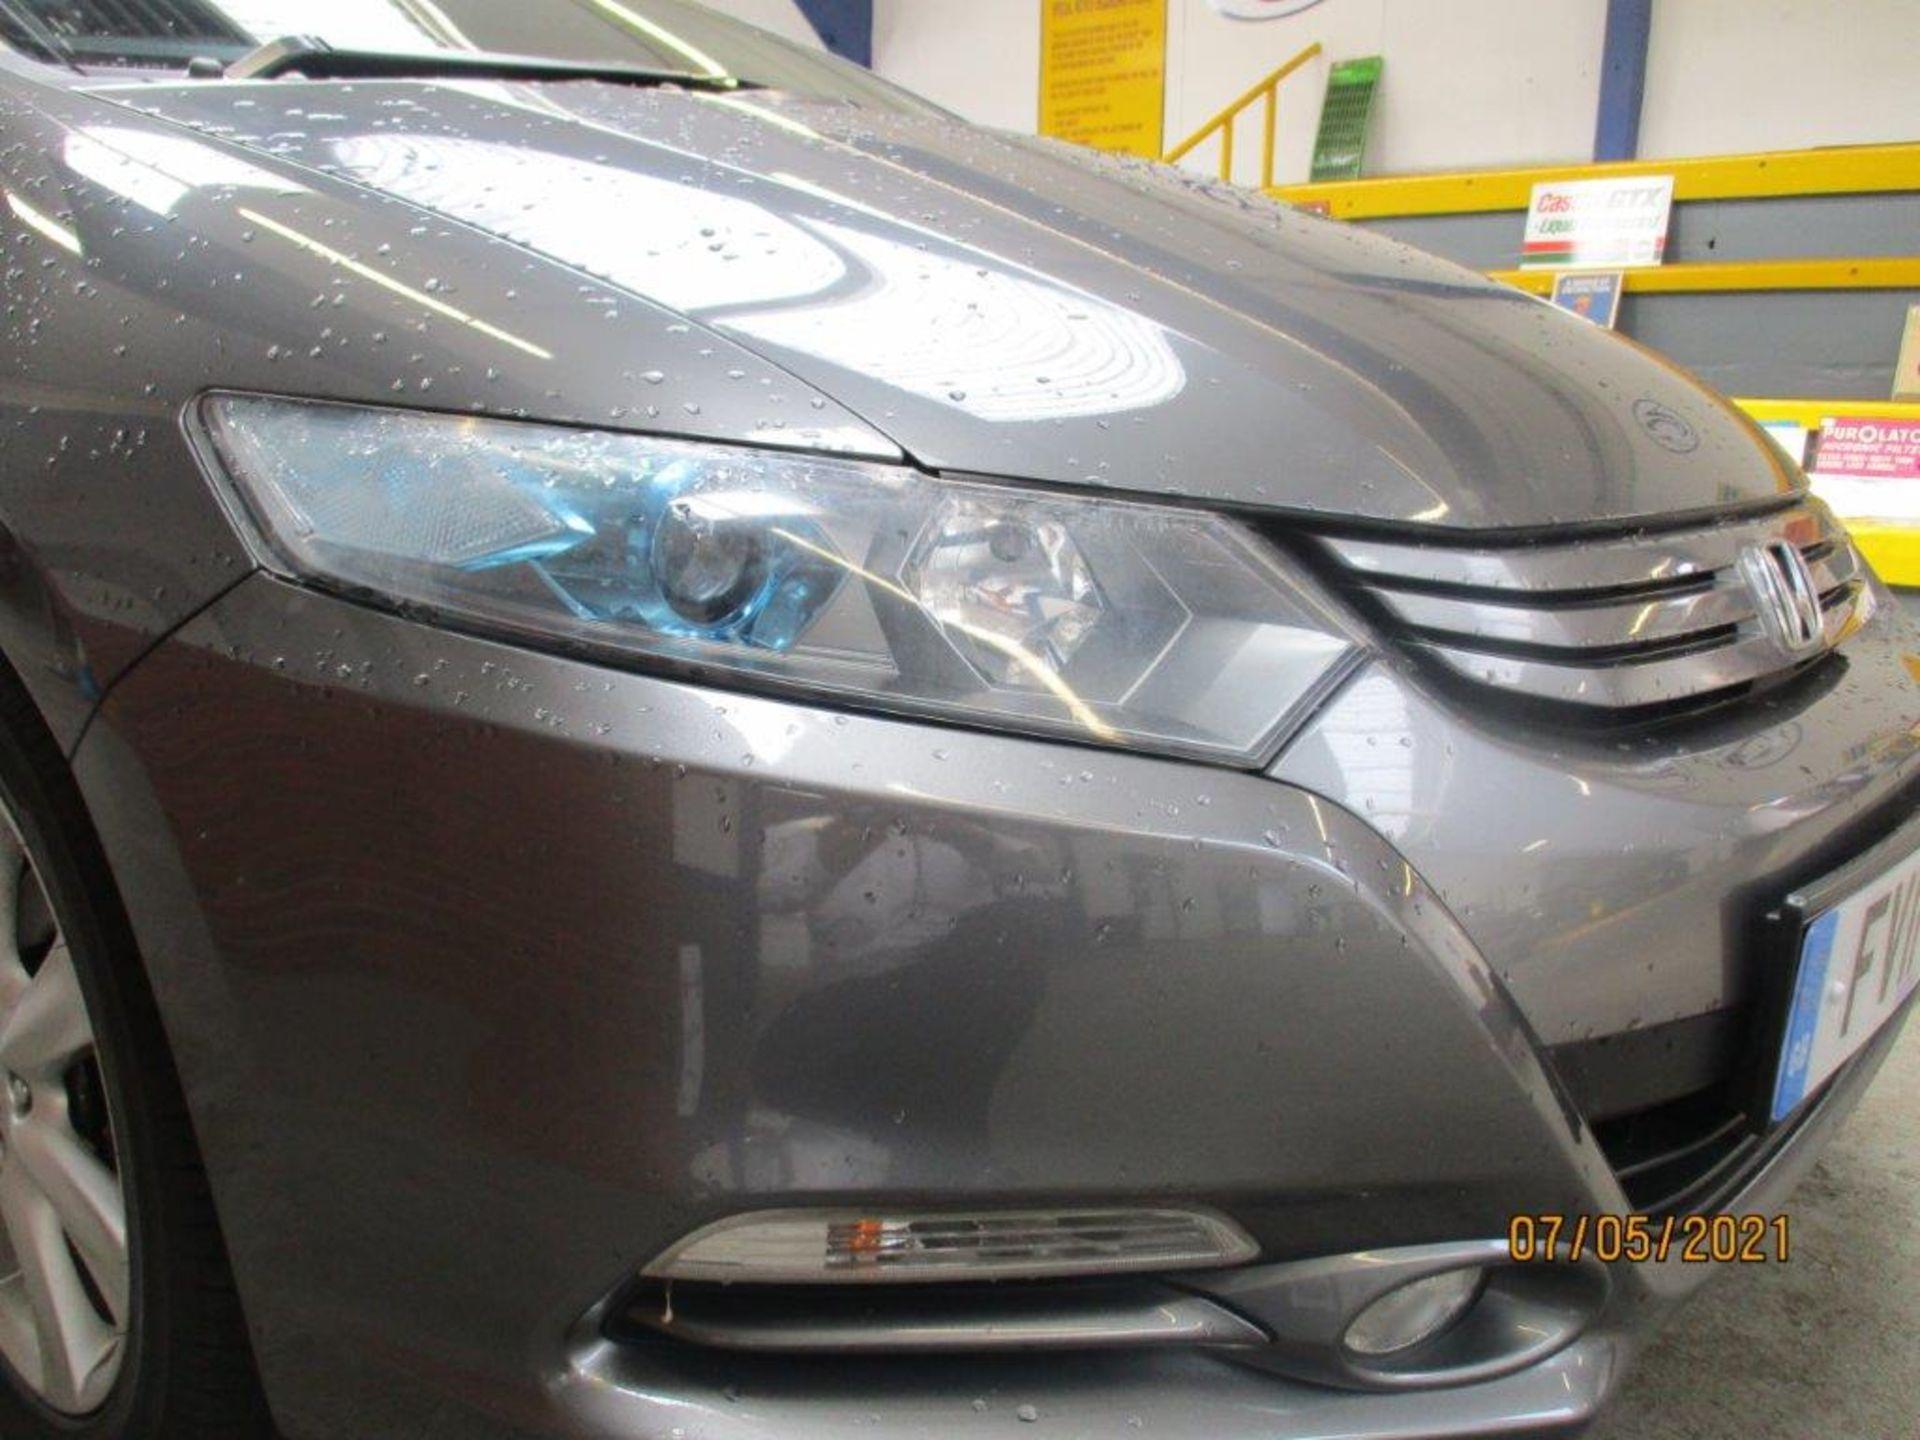 11 11 Honda Insight ES CVT - Image 16 of 21